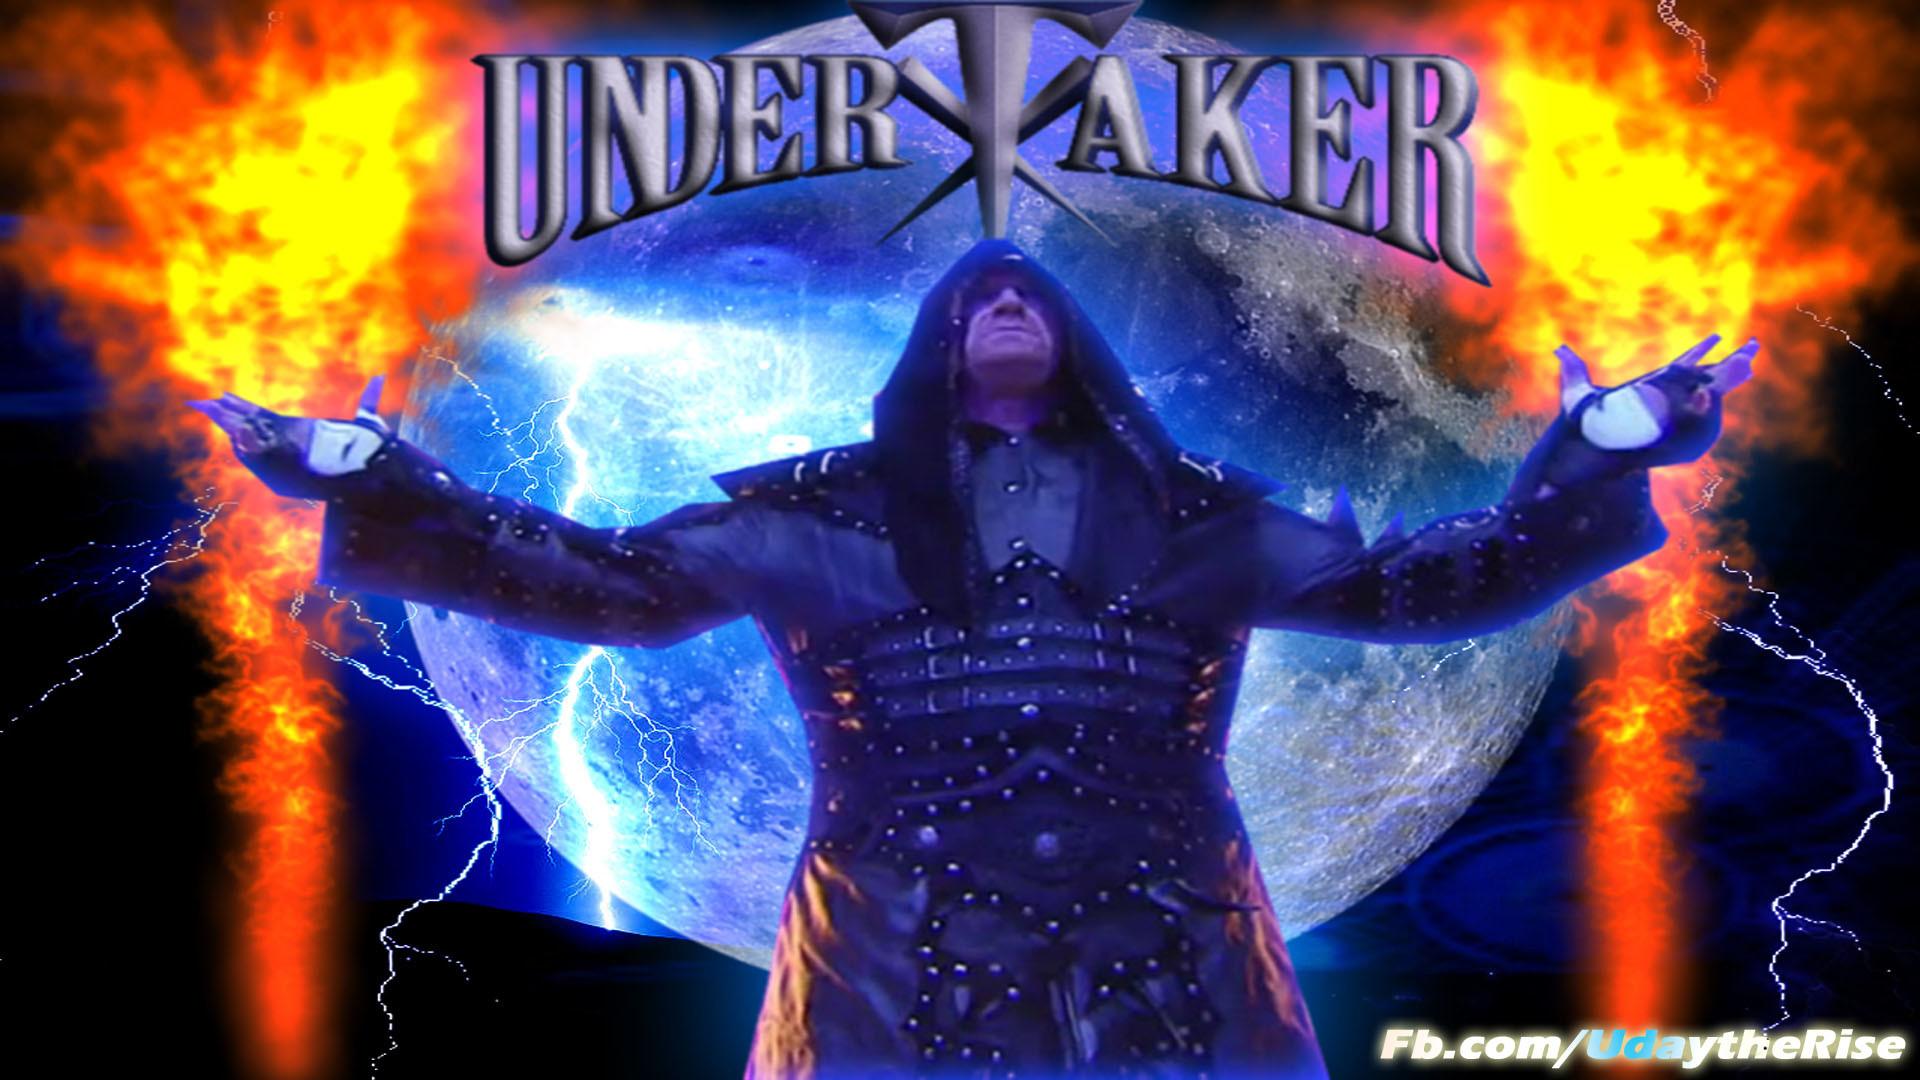 Undertaker Wallpapers Free Download WWE